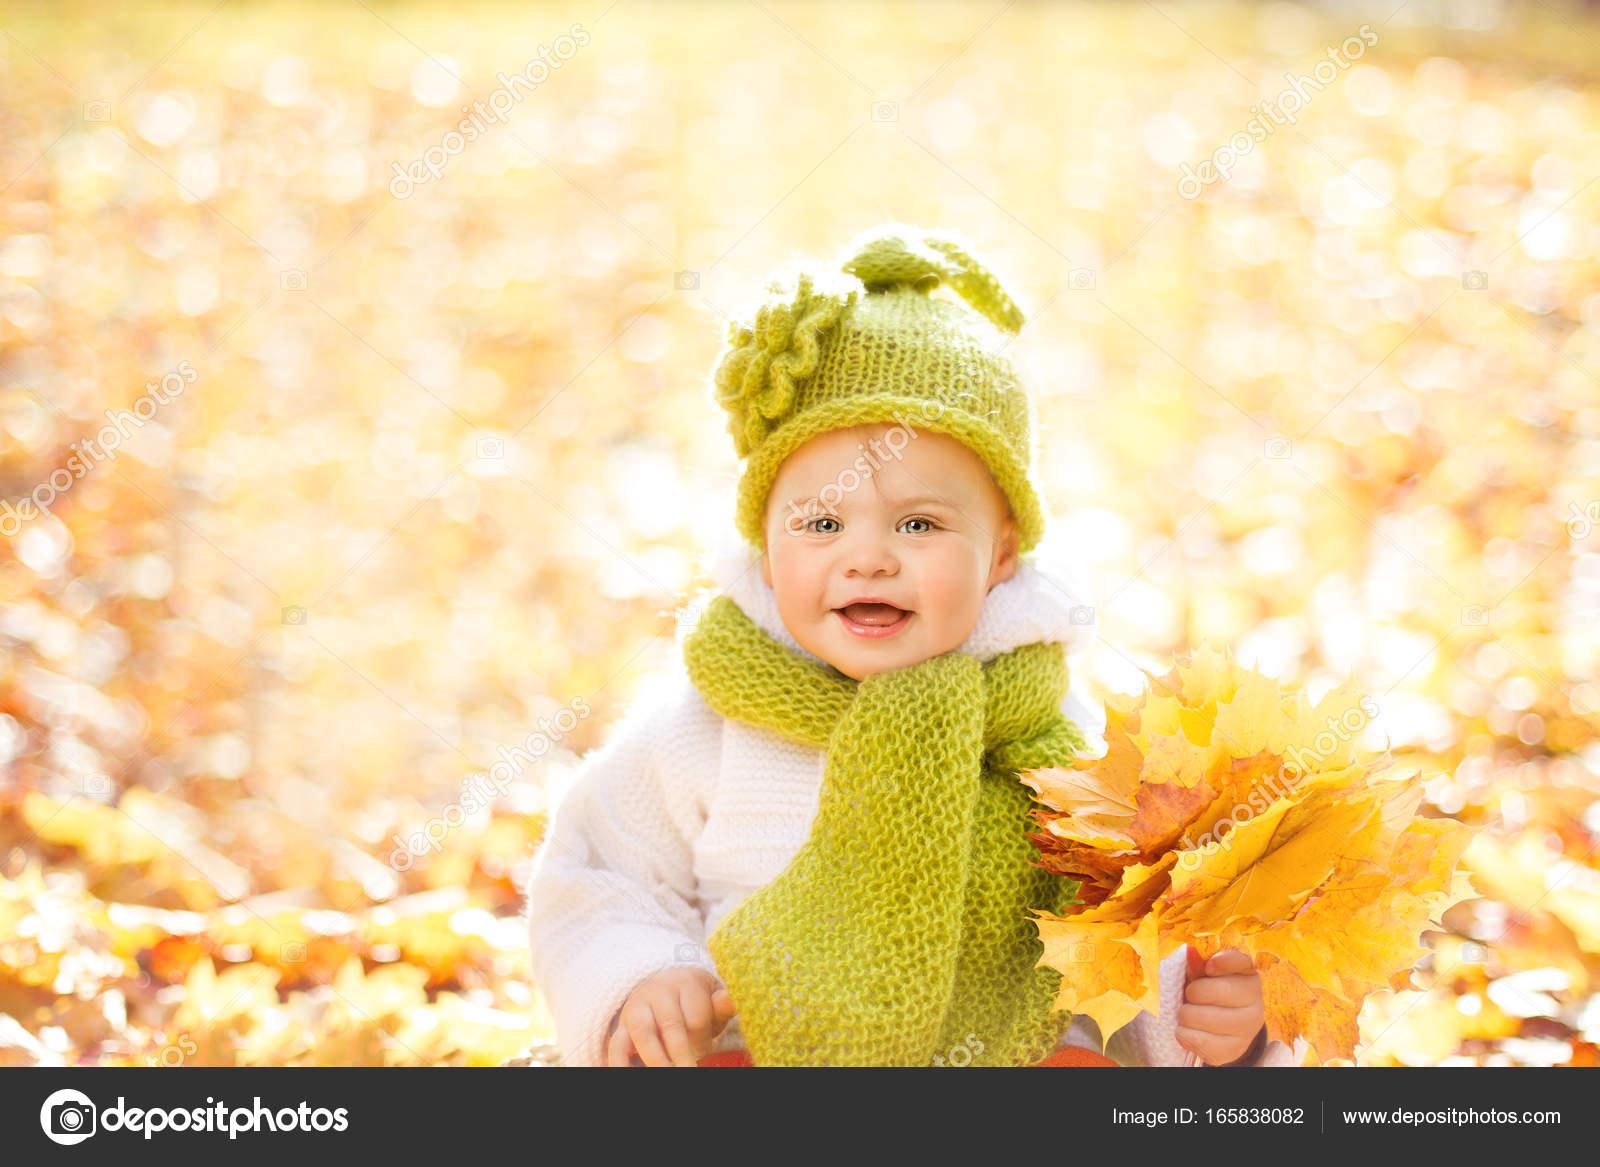 9e9db39f263 Φθινόπωρο μωρό, η Happy Kid πορτραίτο σε εξωτερικούς χώρους με κίτρινο  πτώση των φύλλων,